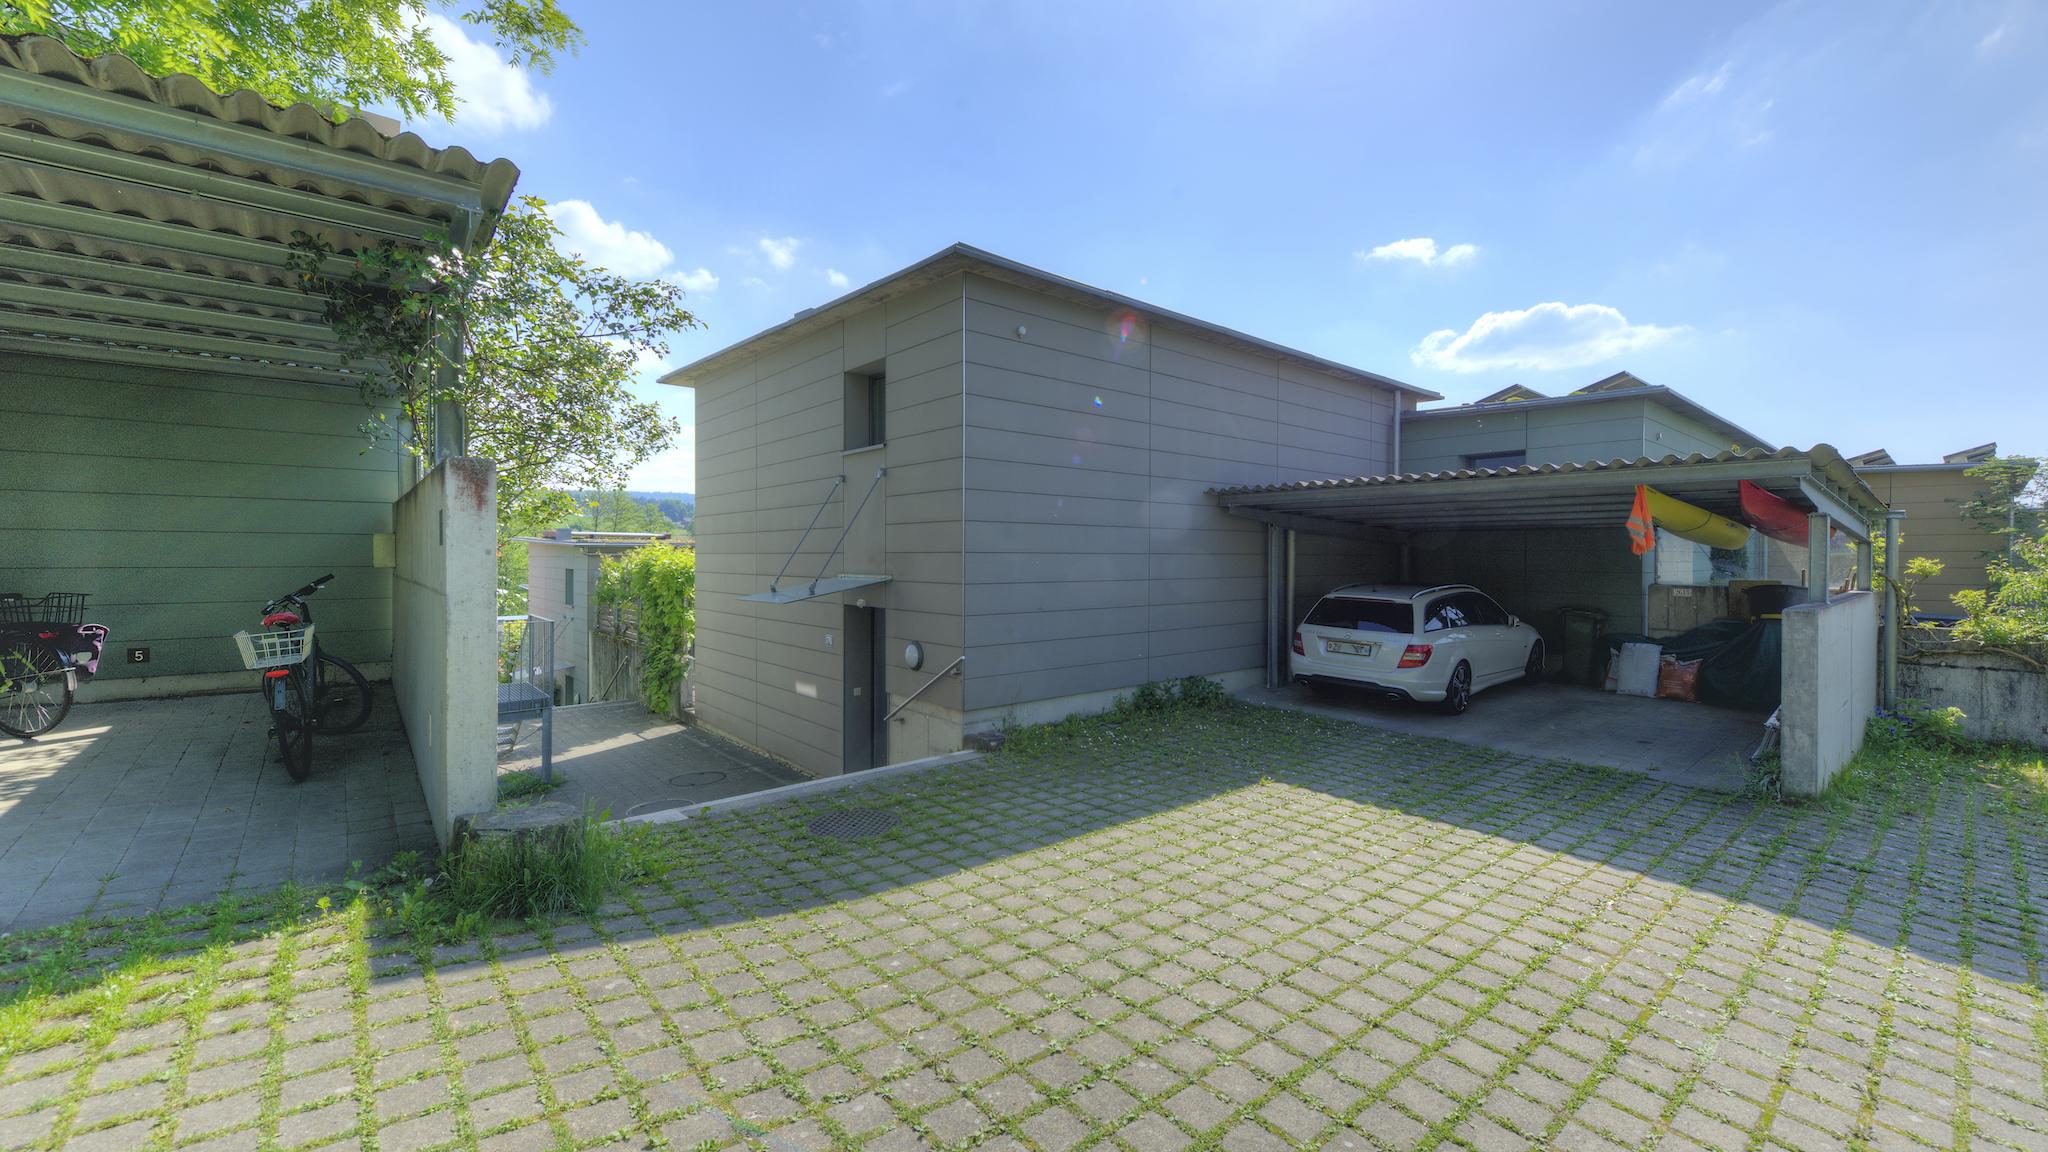 Haus mit dem Carport (weisses Auto)